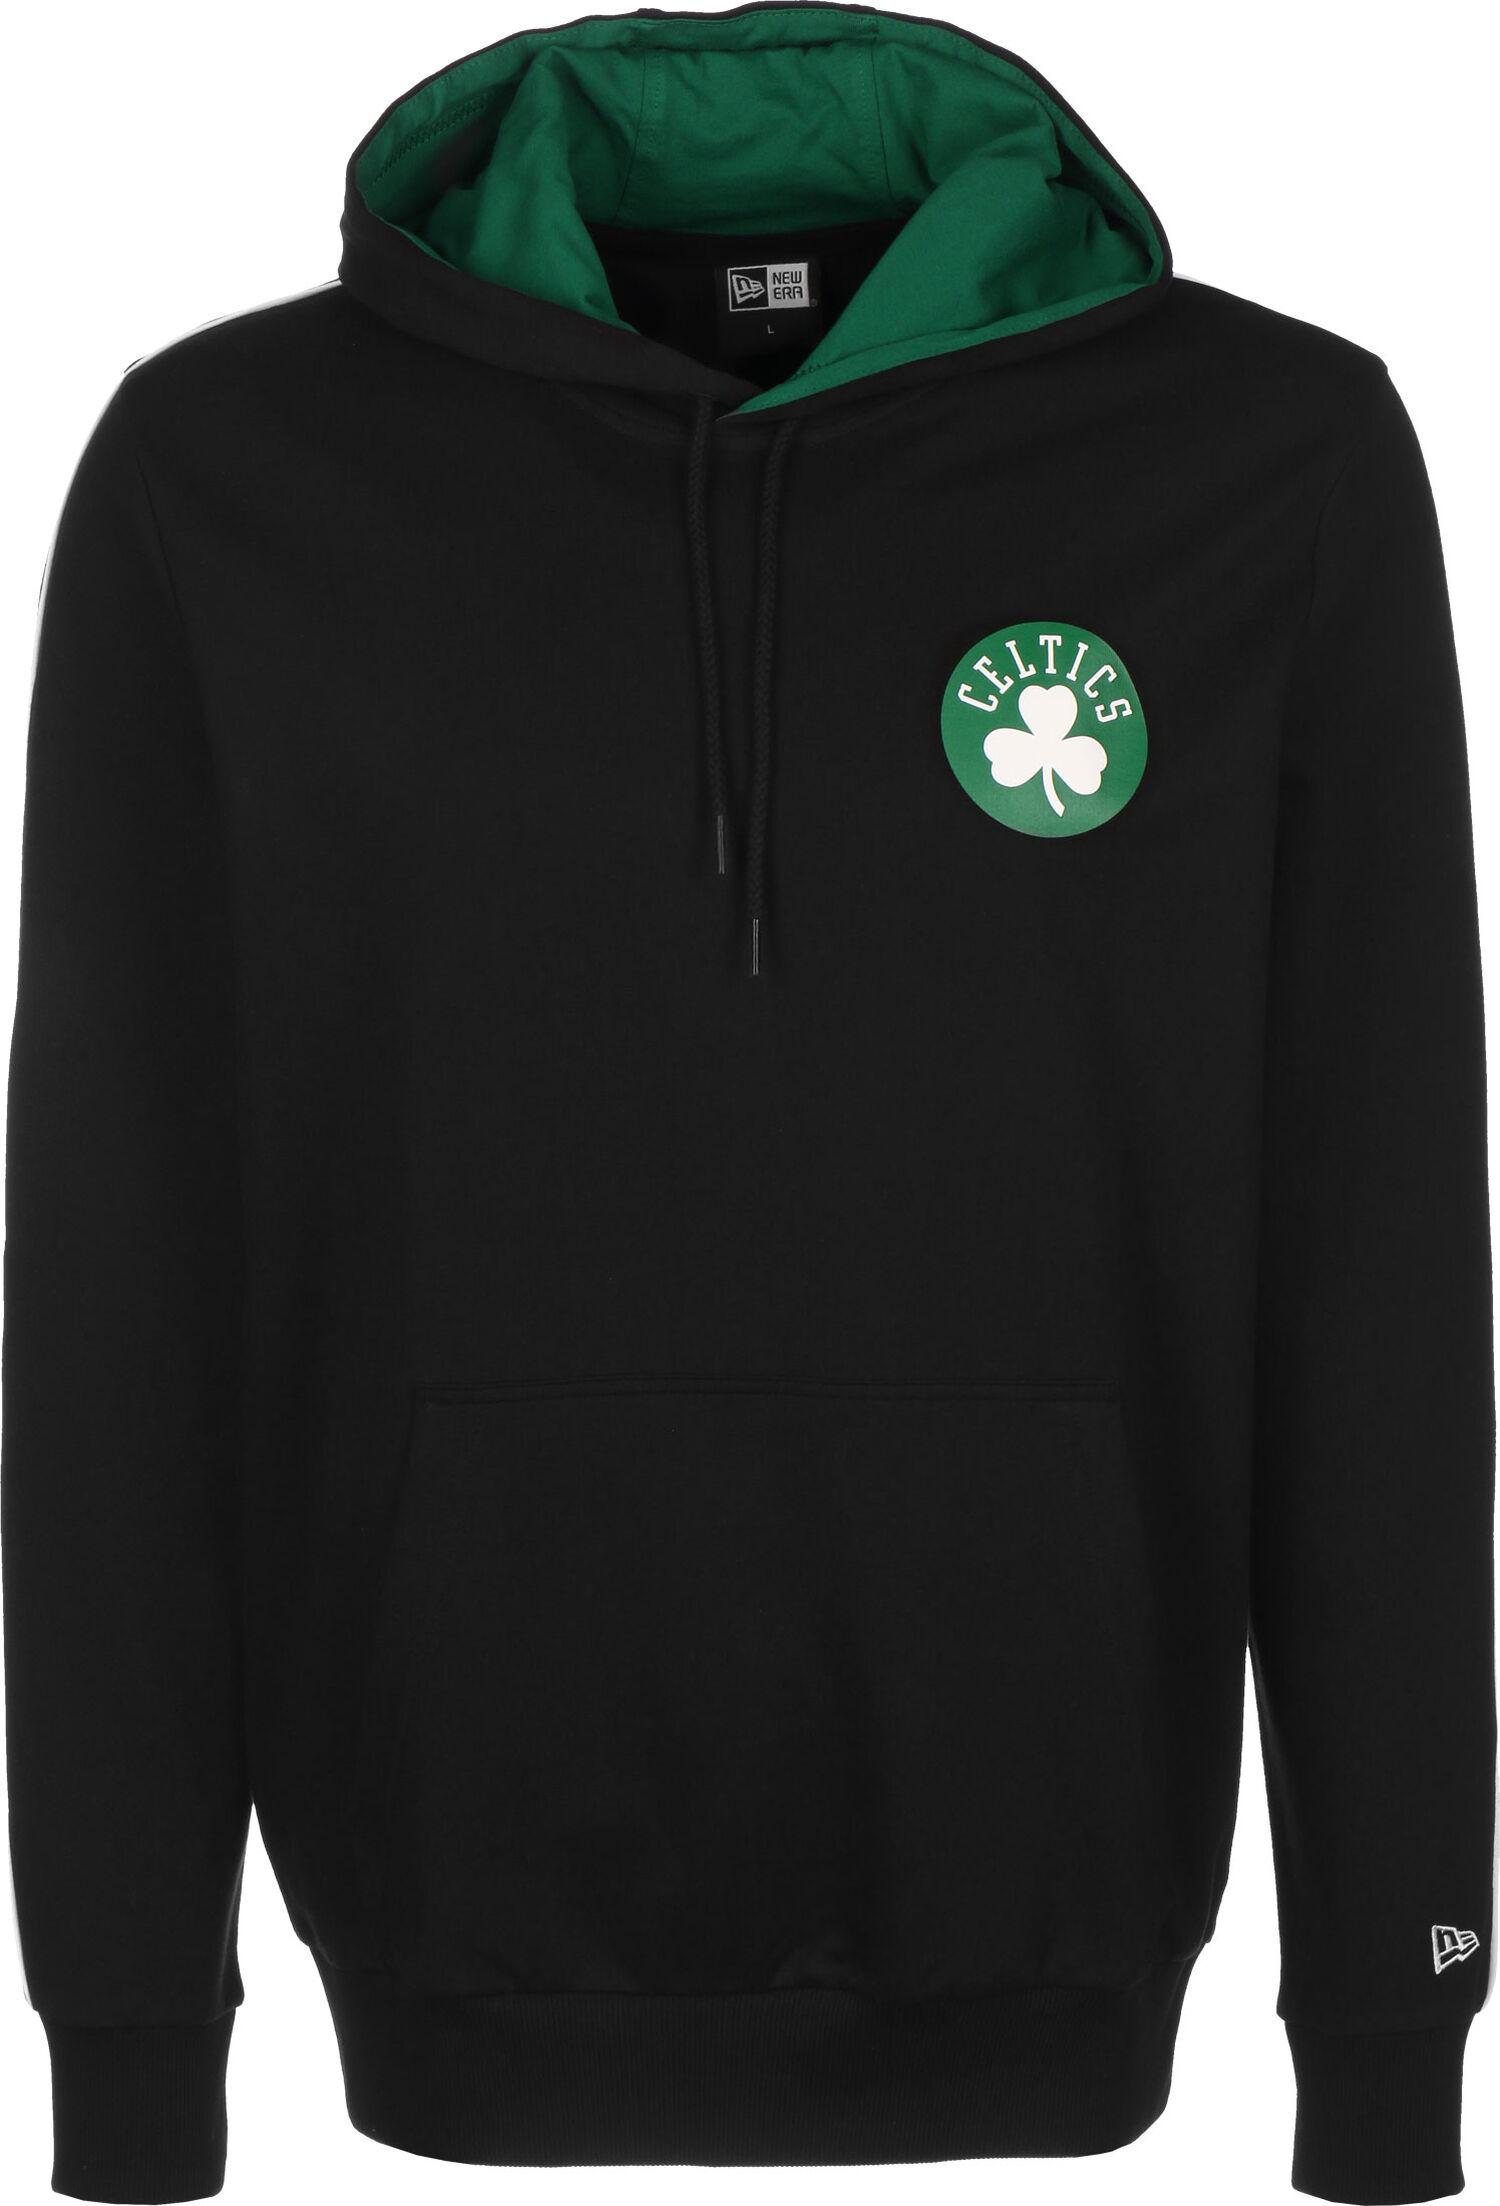 NBA Engineered Half Zip Boston Celtics